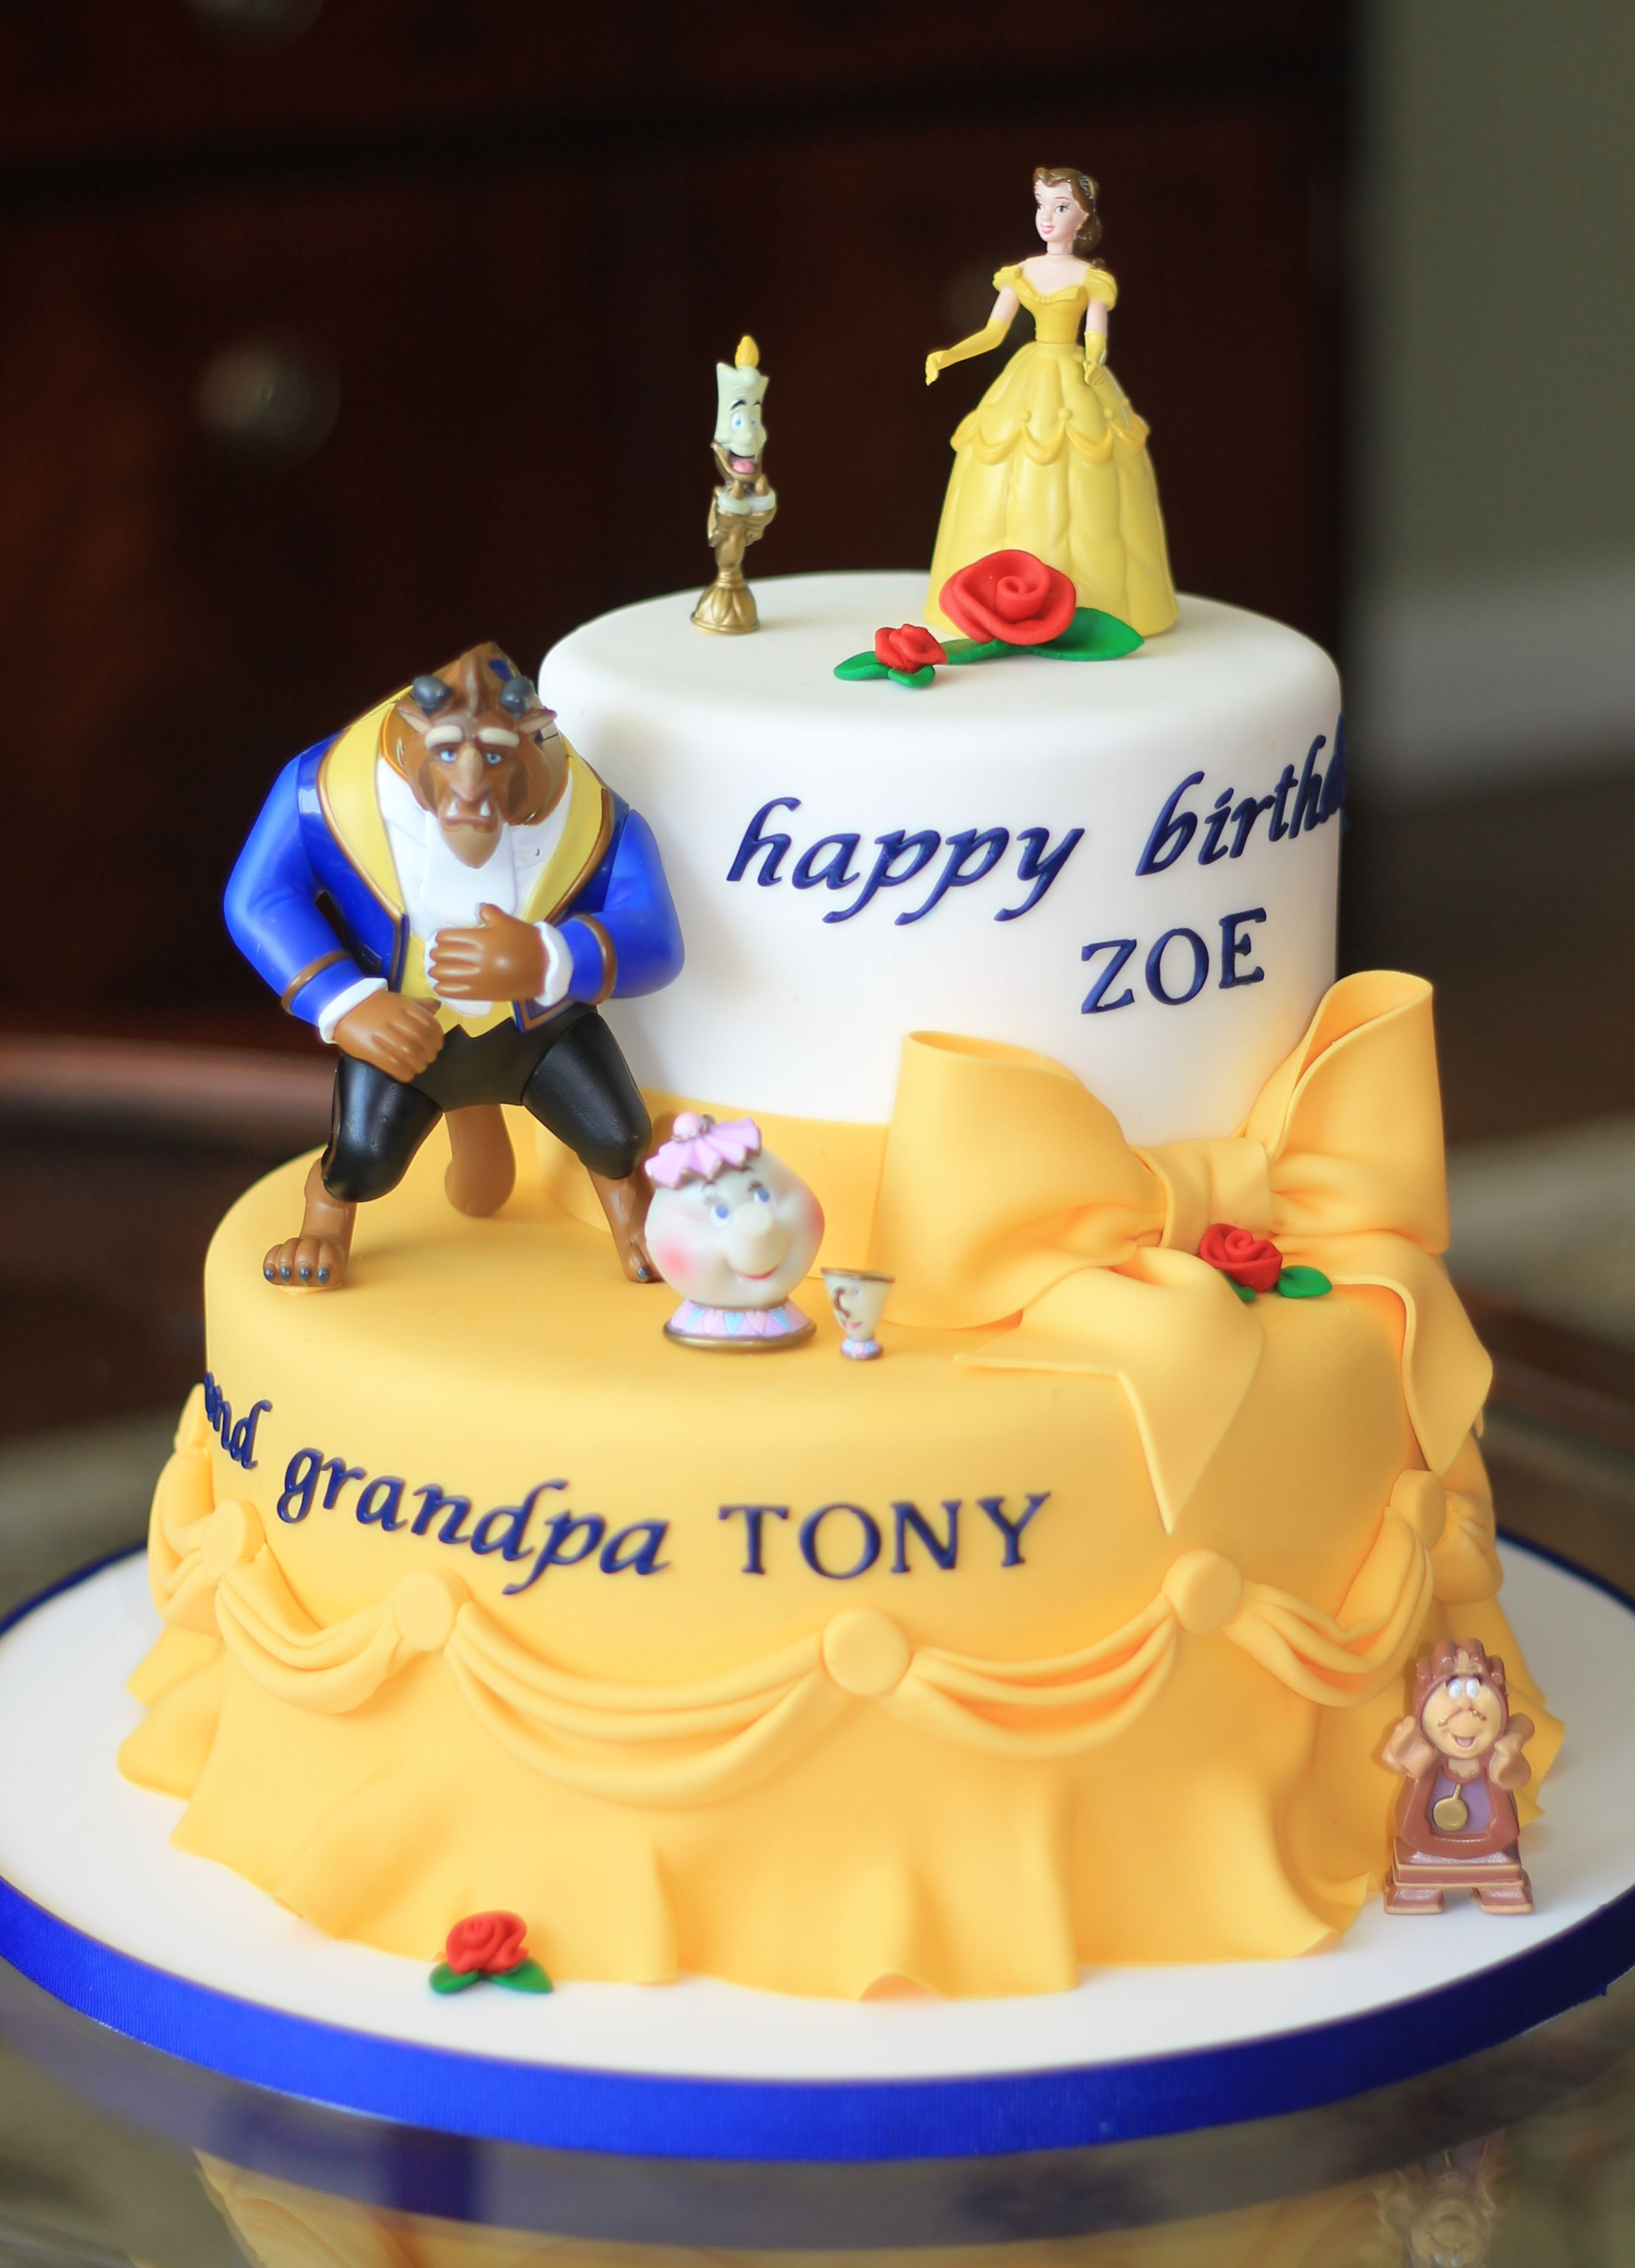 Beauty and the beast cake Cakesparty ideas Pinterest Beast